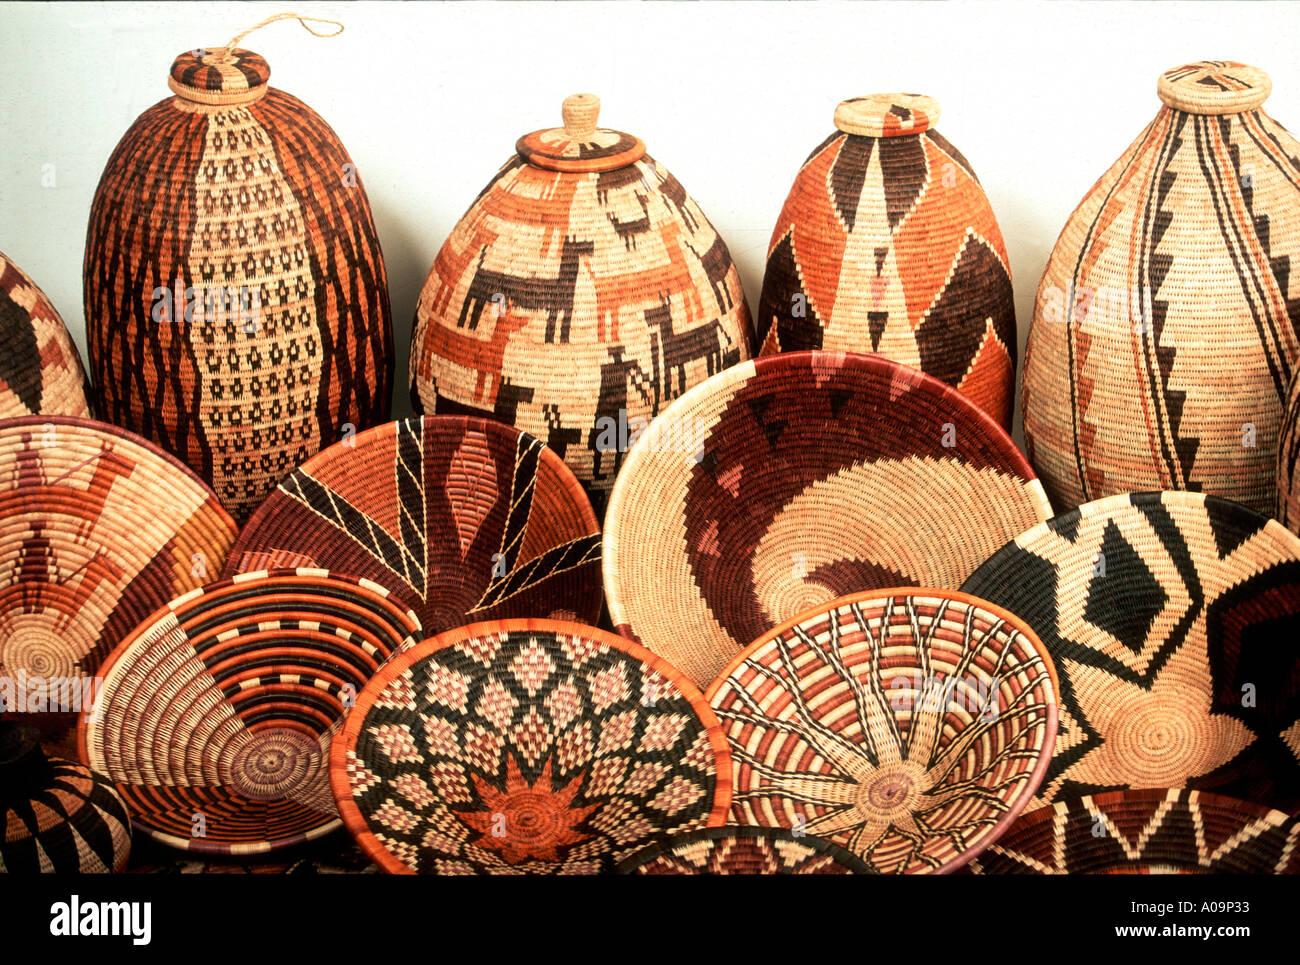 Basket Weaving Botswana : Collection of botswana baskets stock photo royalty free